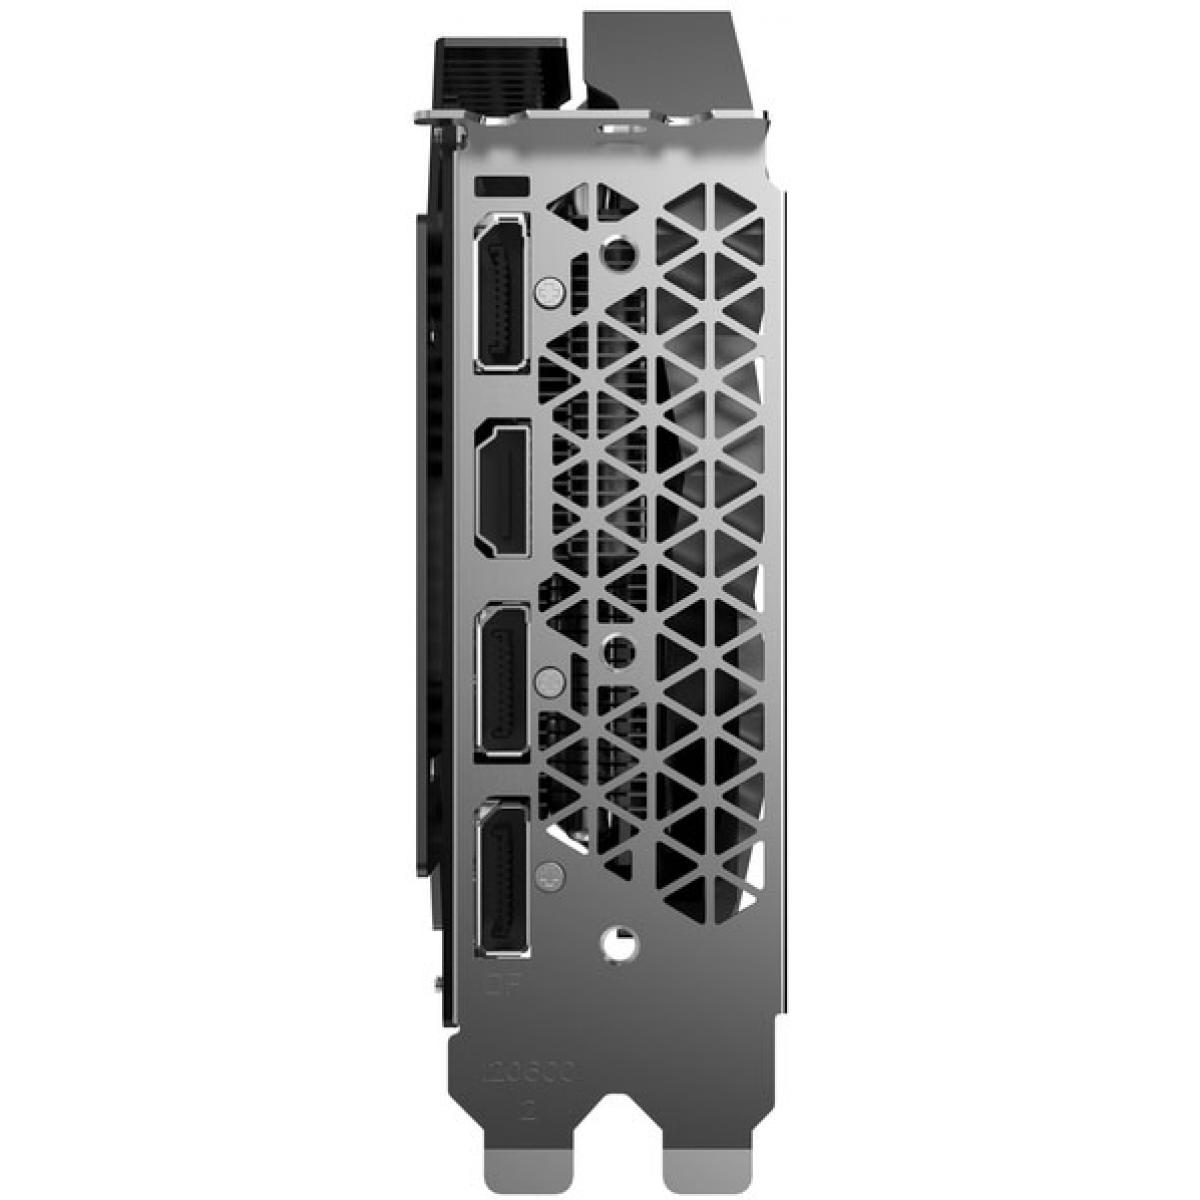 Placa de Vídeo Zotac GeForce GTX 1660 Ti AMP! Dual, 6GB GDDR6, 192Bit